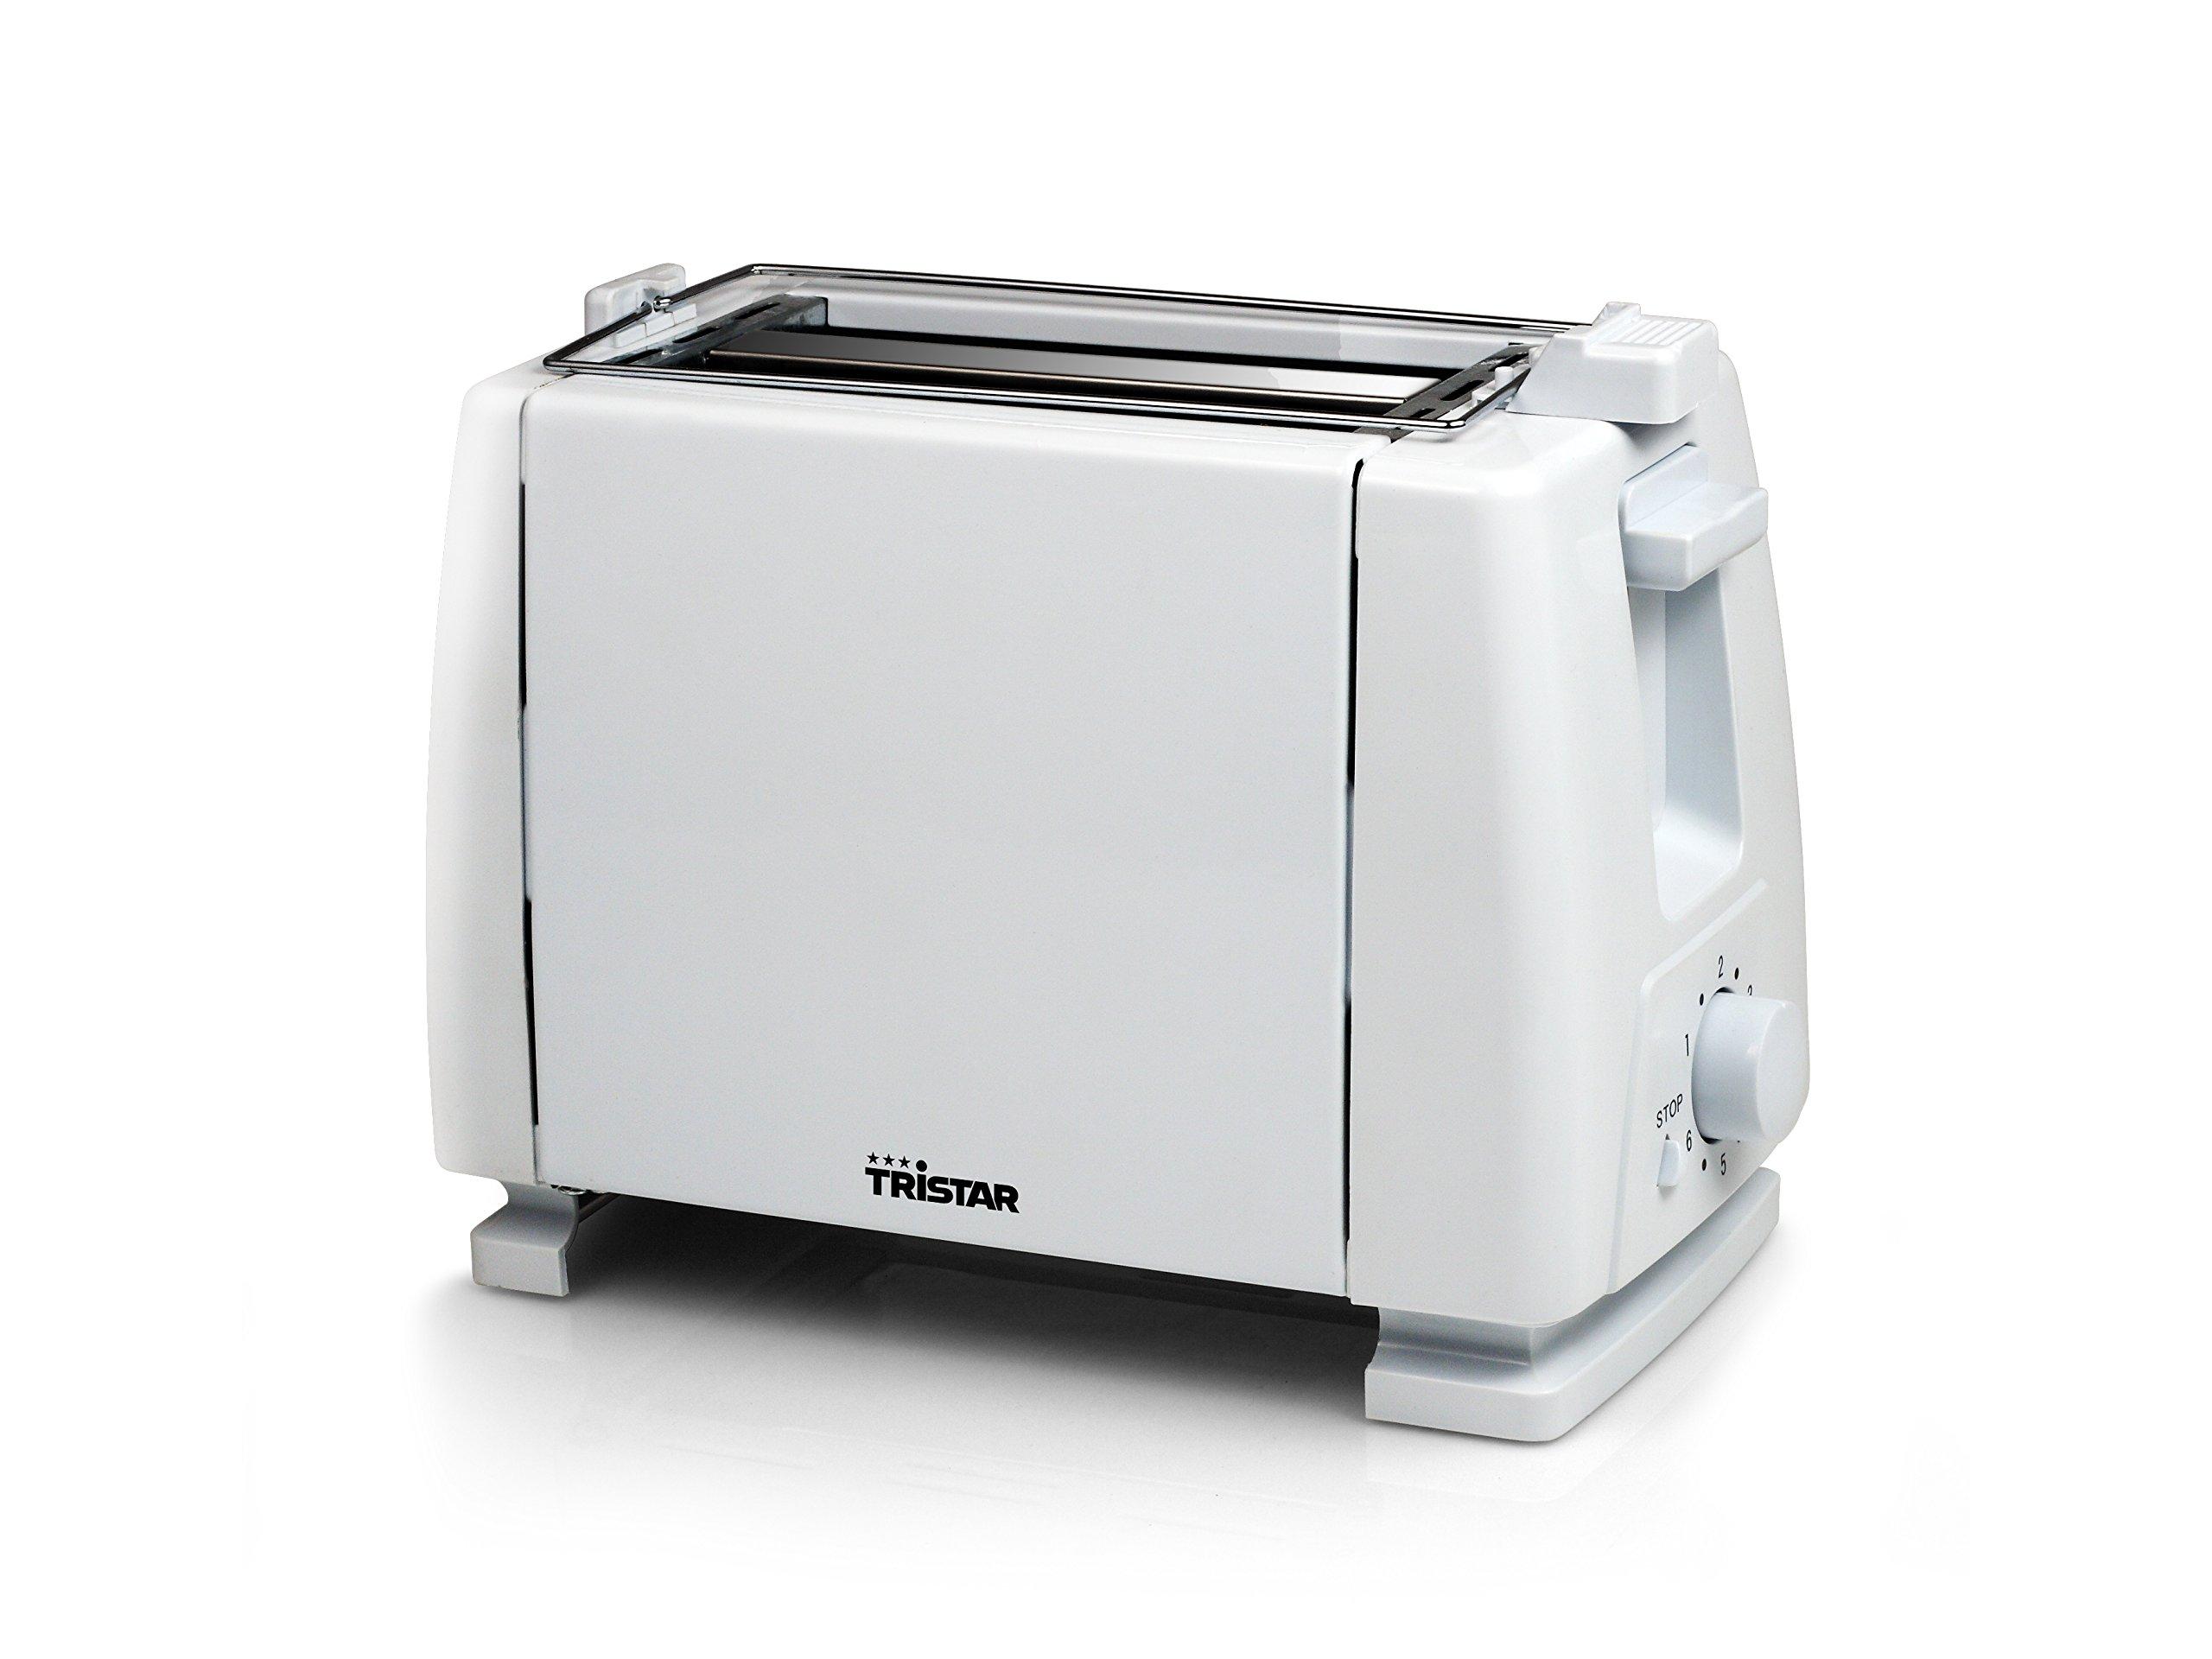 Tristar-Toaster-BR-1009